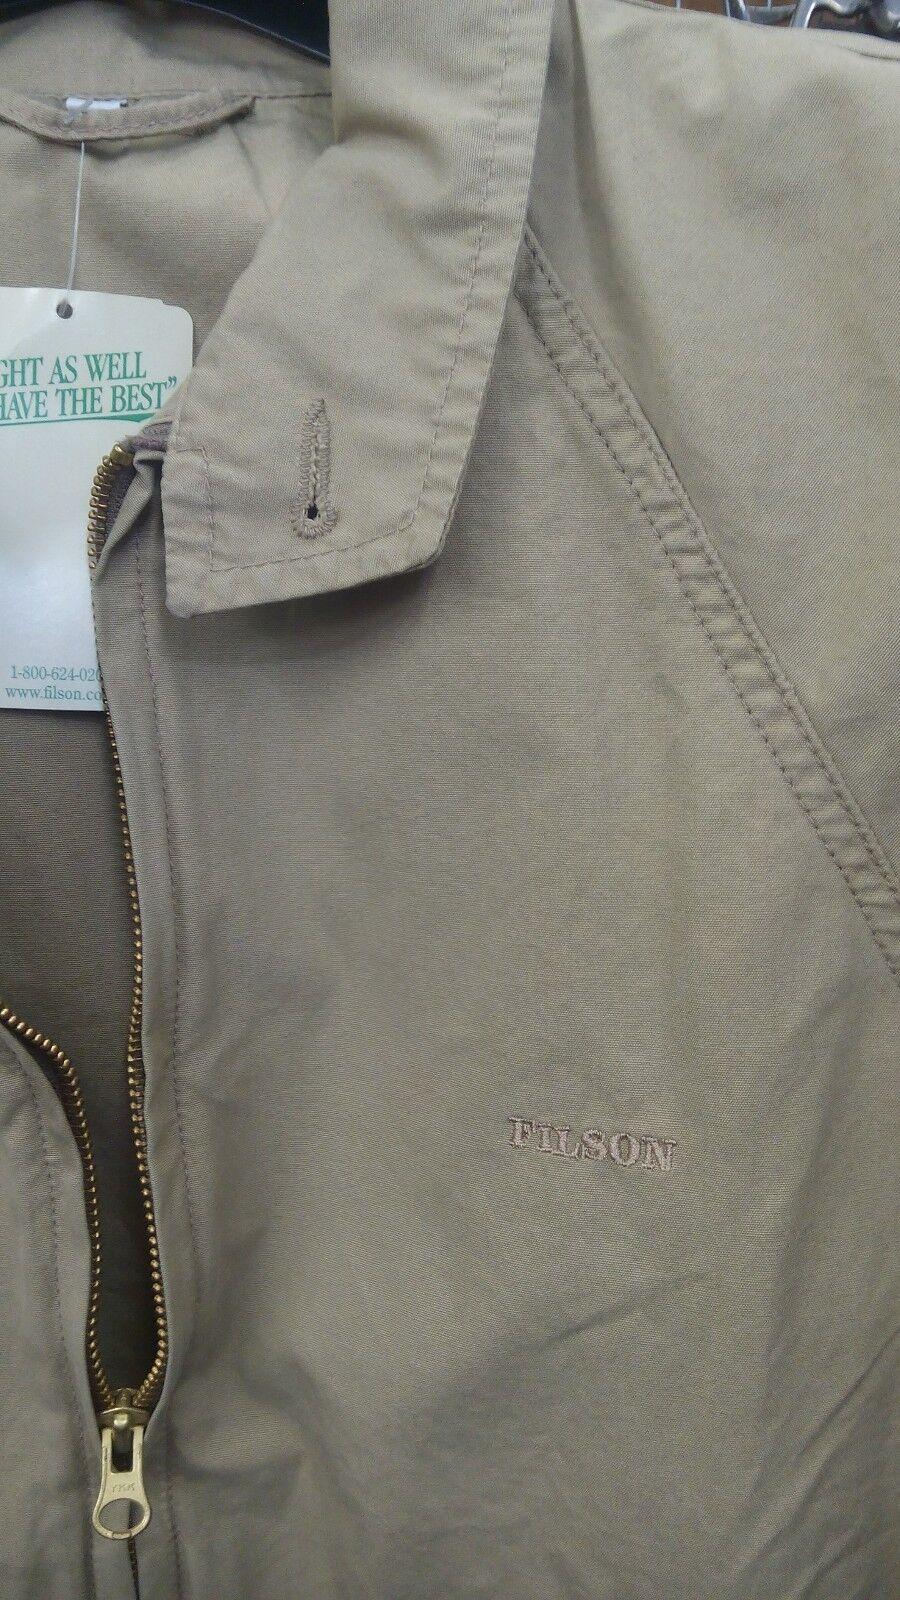 Giacca giubbotto cotone leggero FILSON tg 38 USA 48 ita ita ita 1d3c43